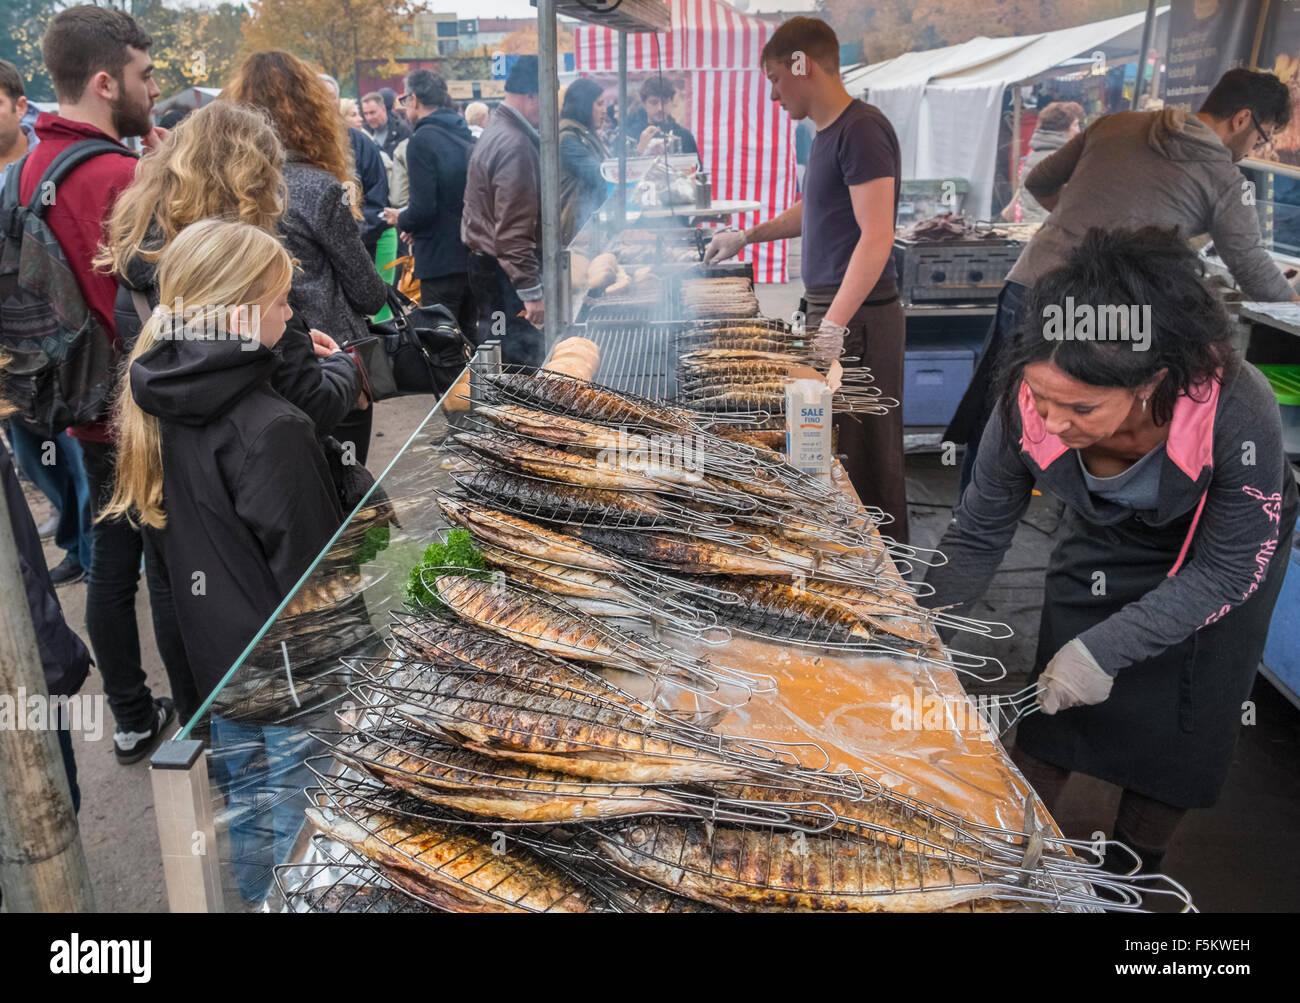 Fresh cooked fish food stall, Mauerpark Sunday fleamarket, Prenzlauer Berg, Berlin, Germany - Stock Image